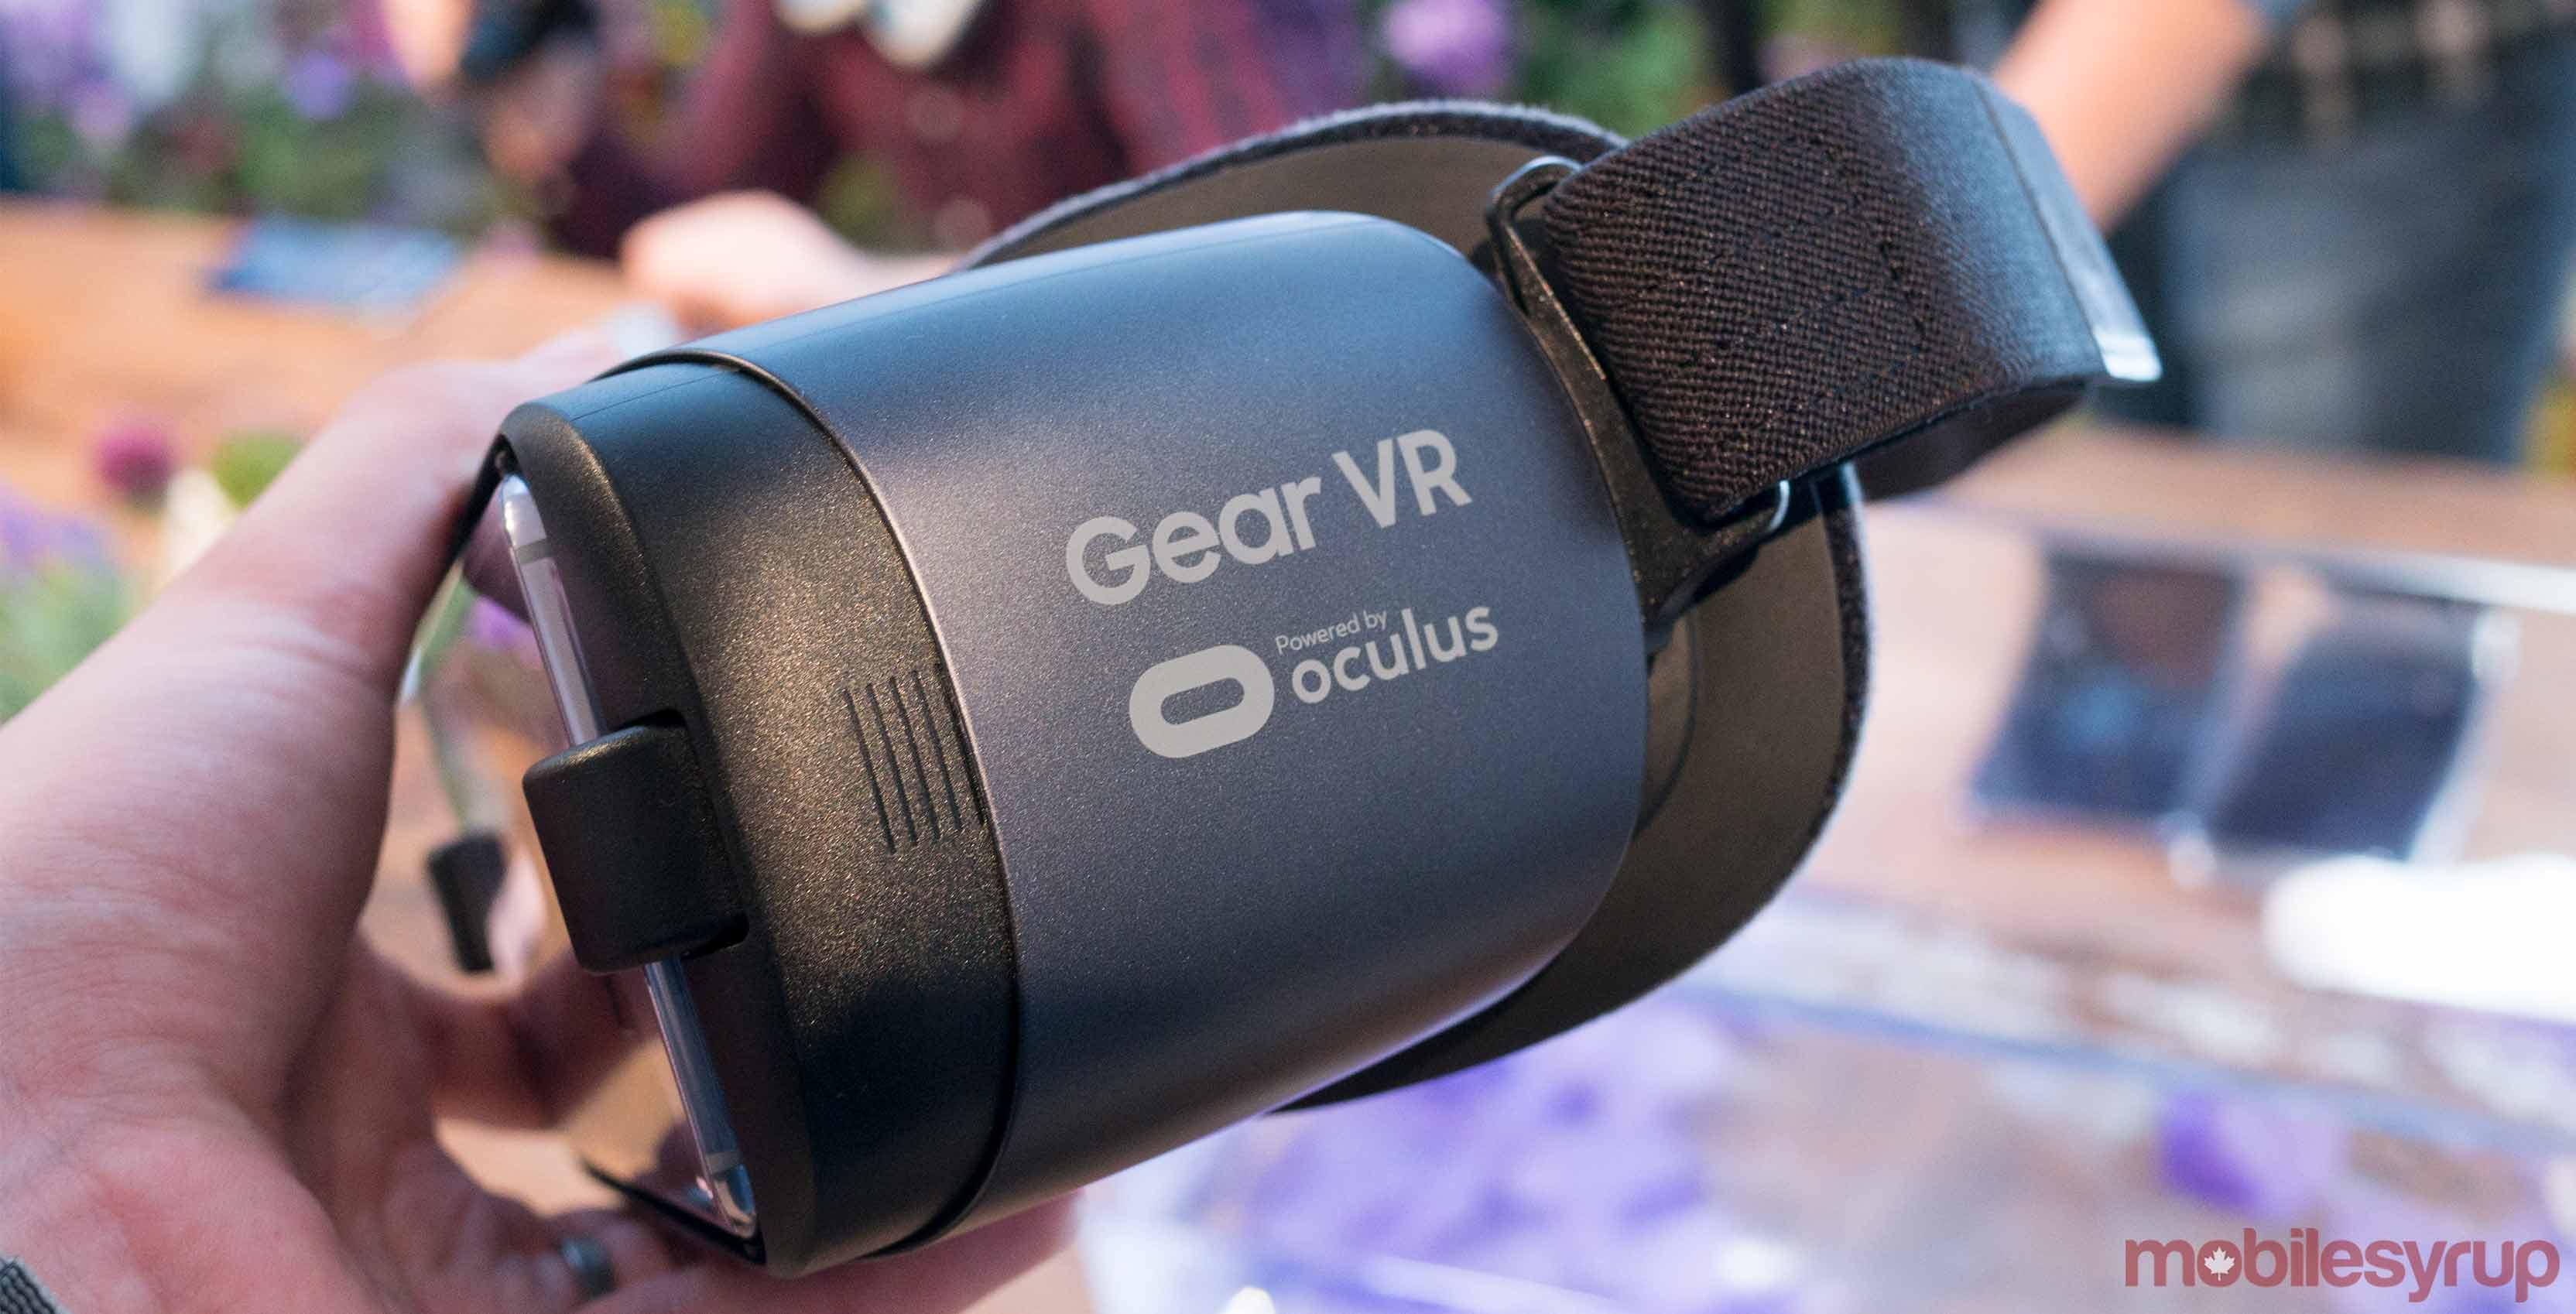 Gear VR side view